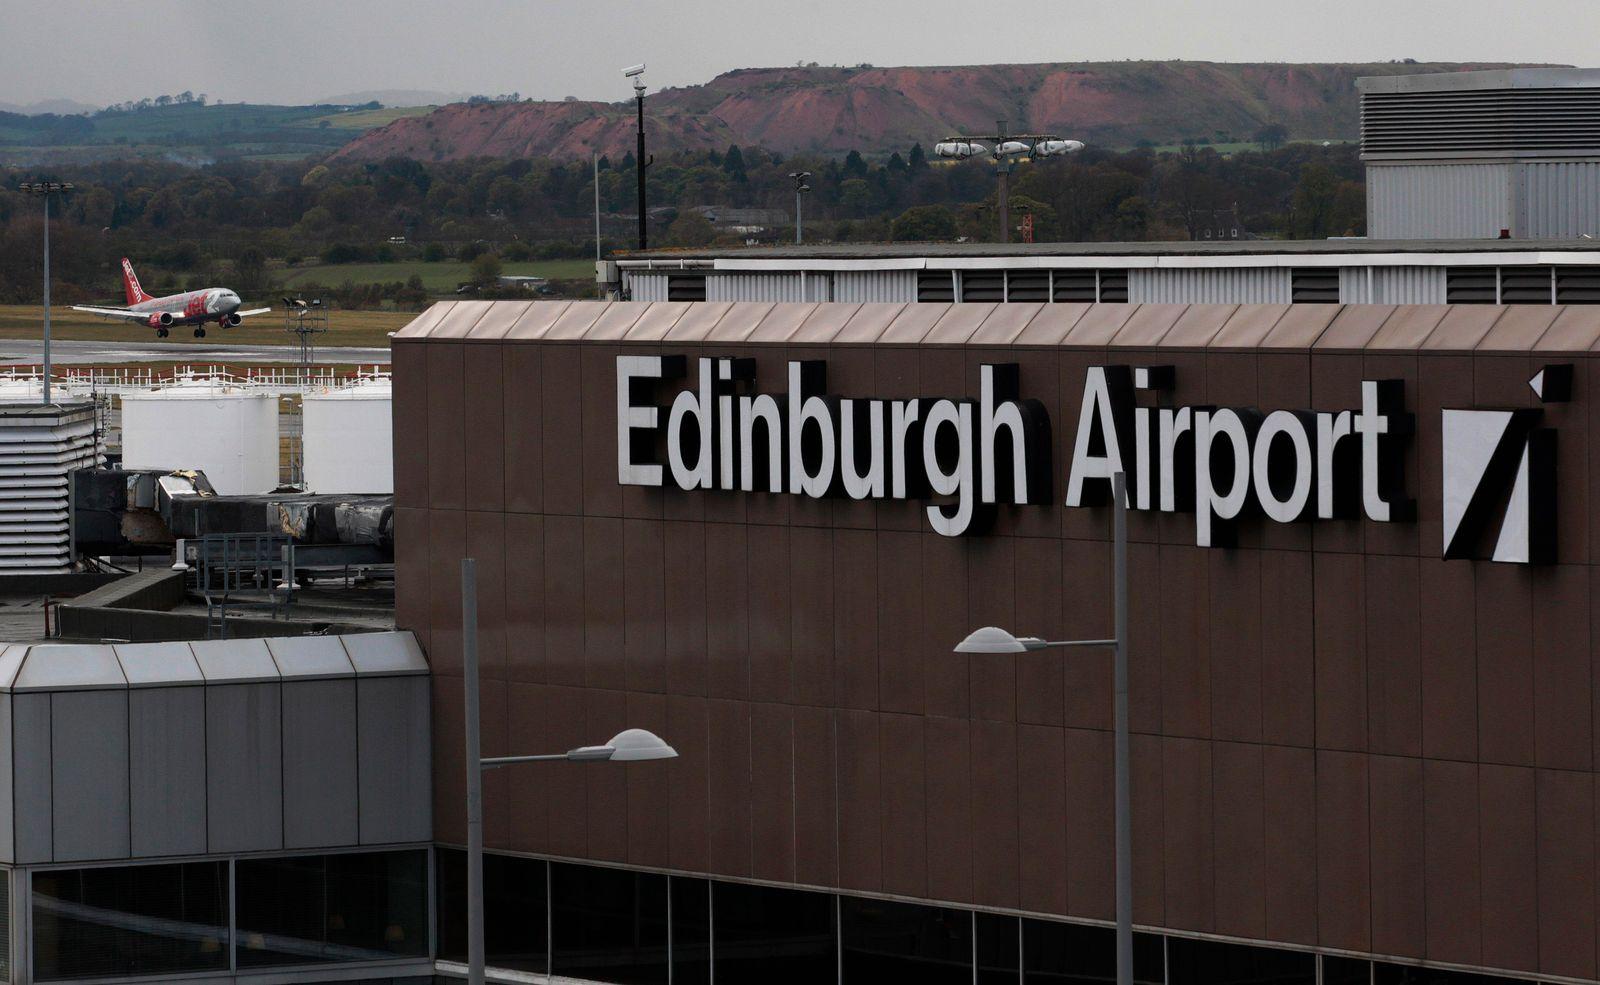 An aircraft lands at Edinburgh Airport in Scotland